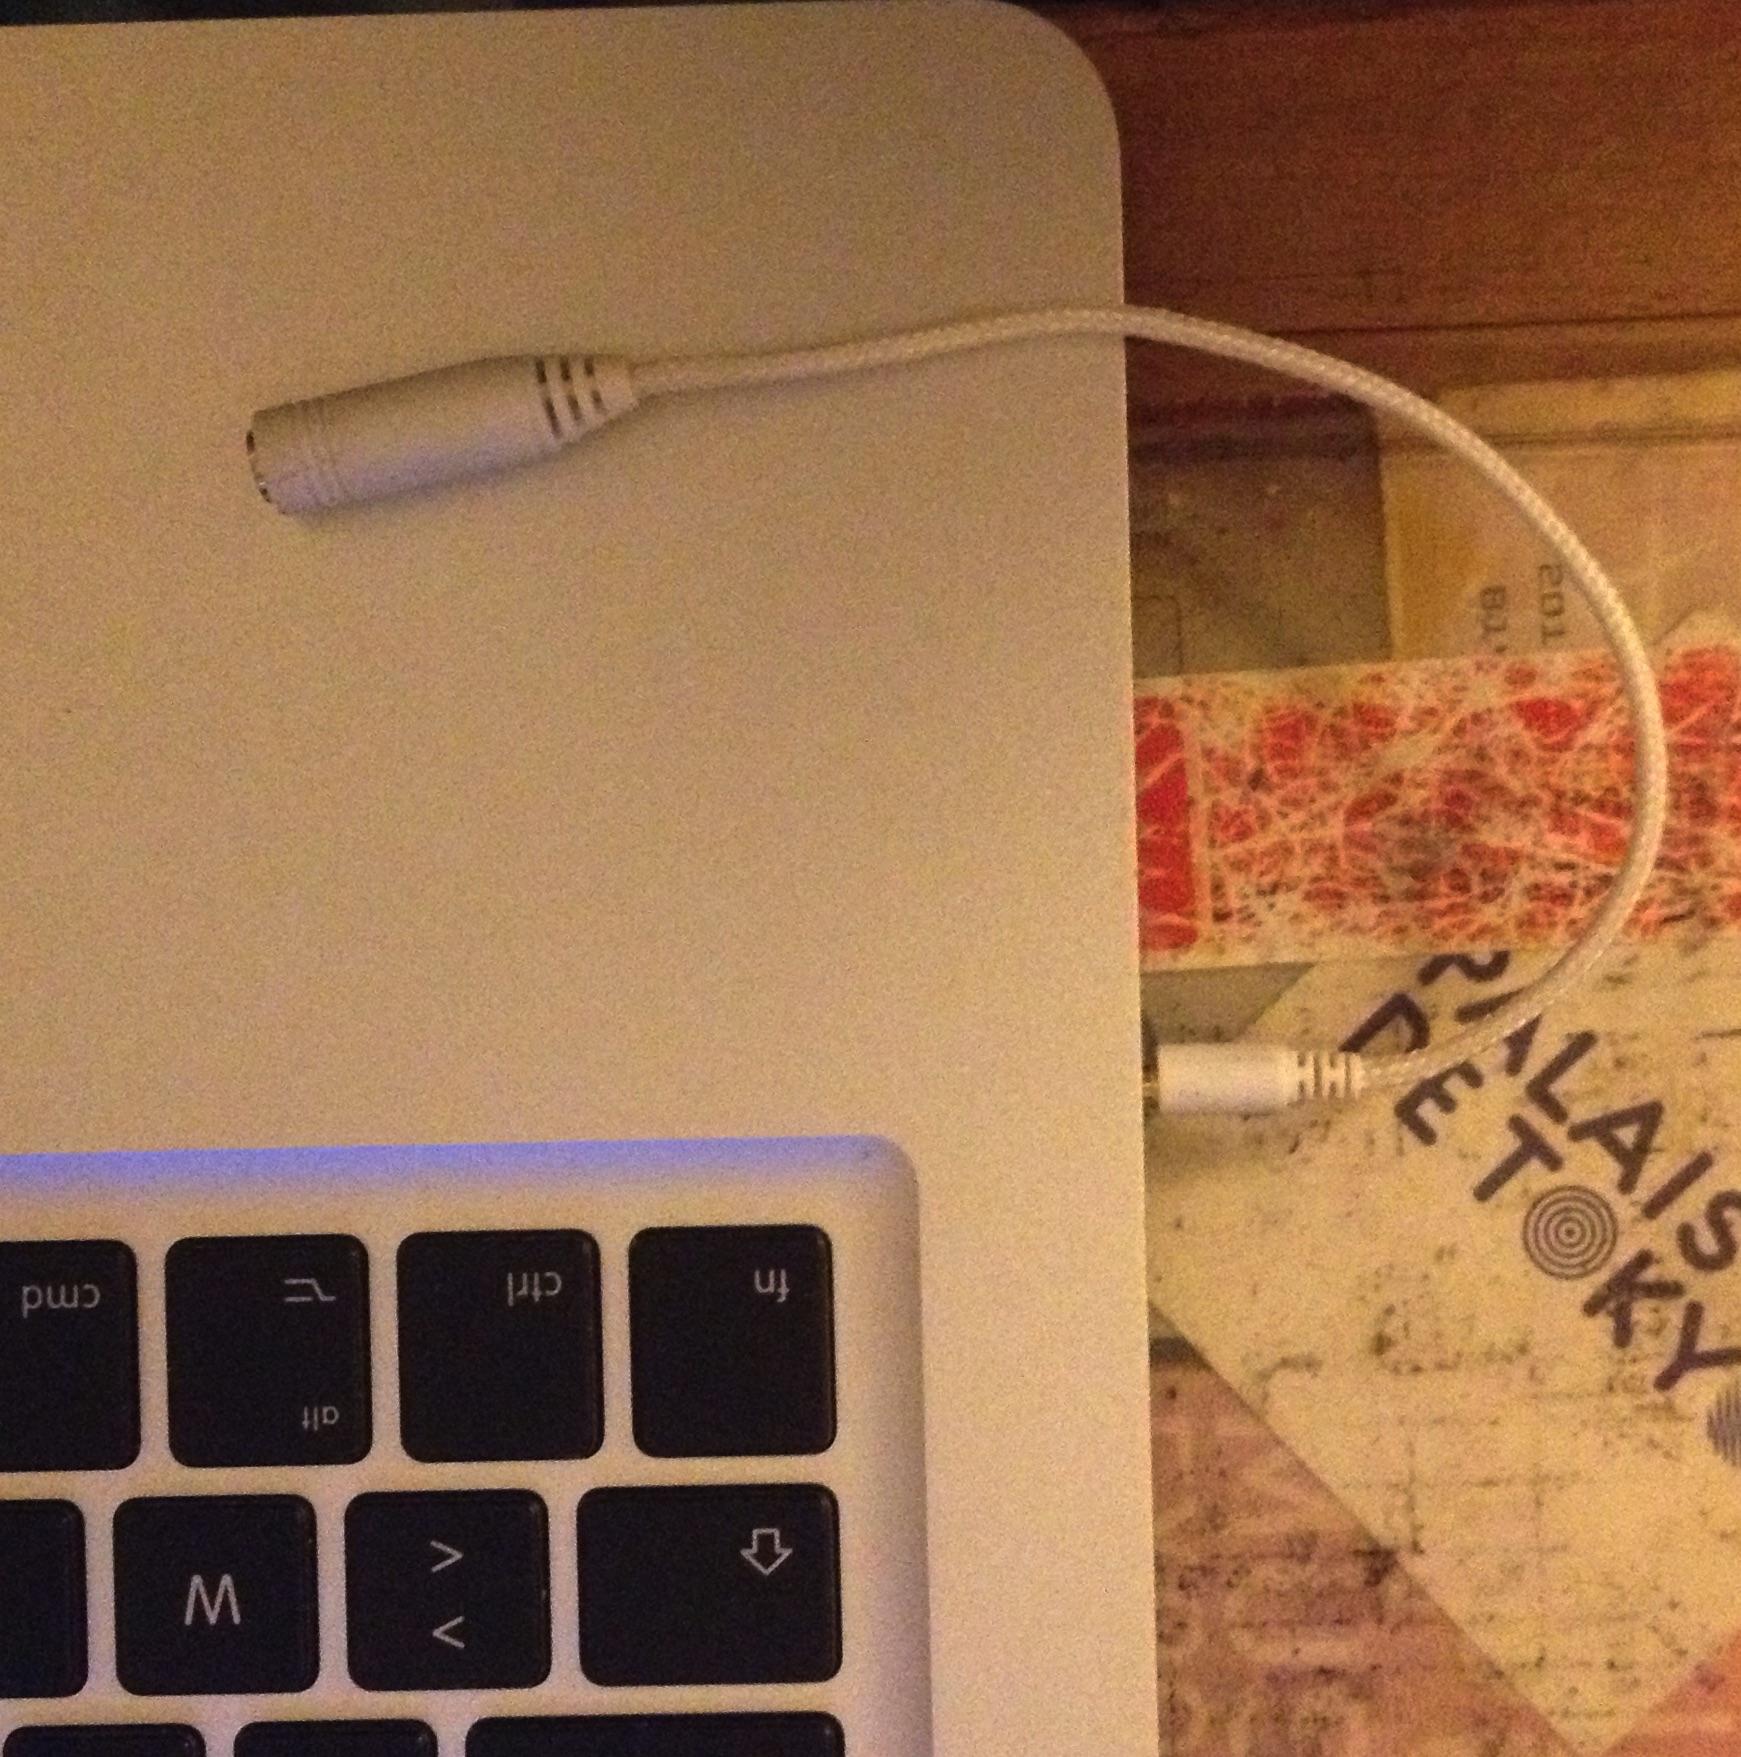 Macbook pro not restarting